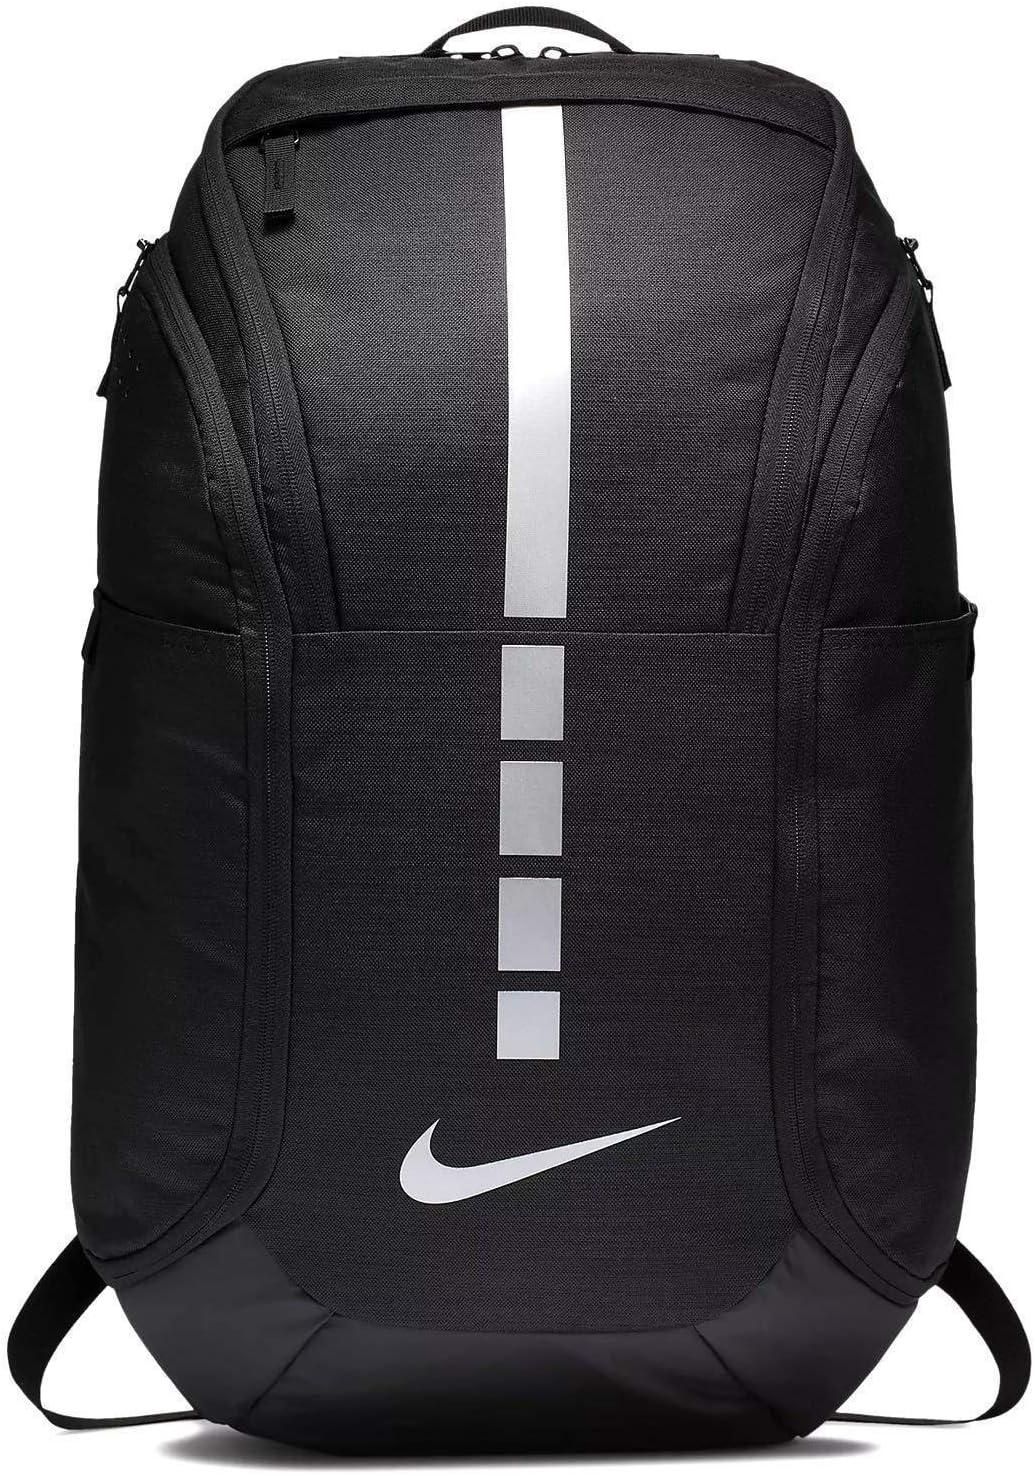 Nike Hoops Elite Hoops Pro Basketball Backpack Black Metallic Cool Grey